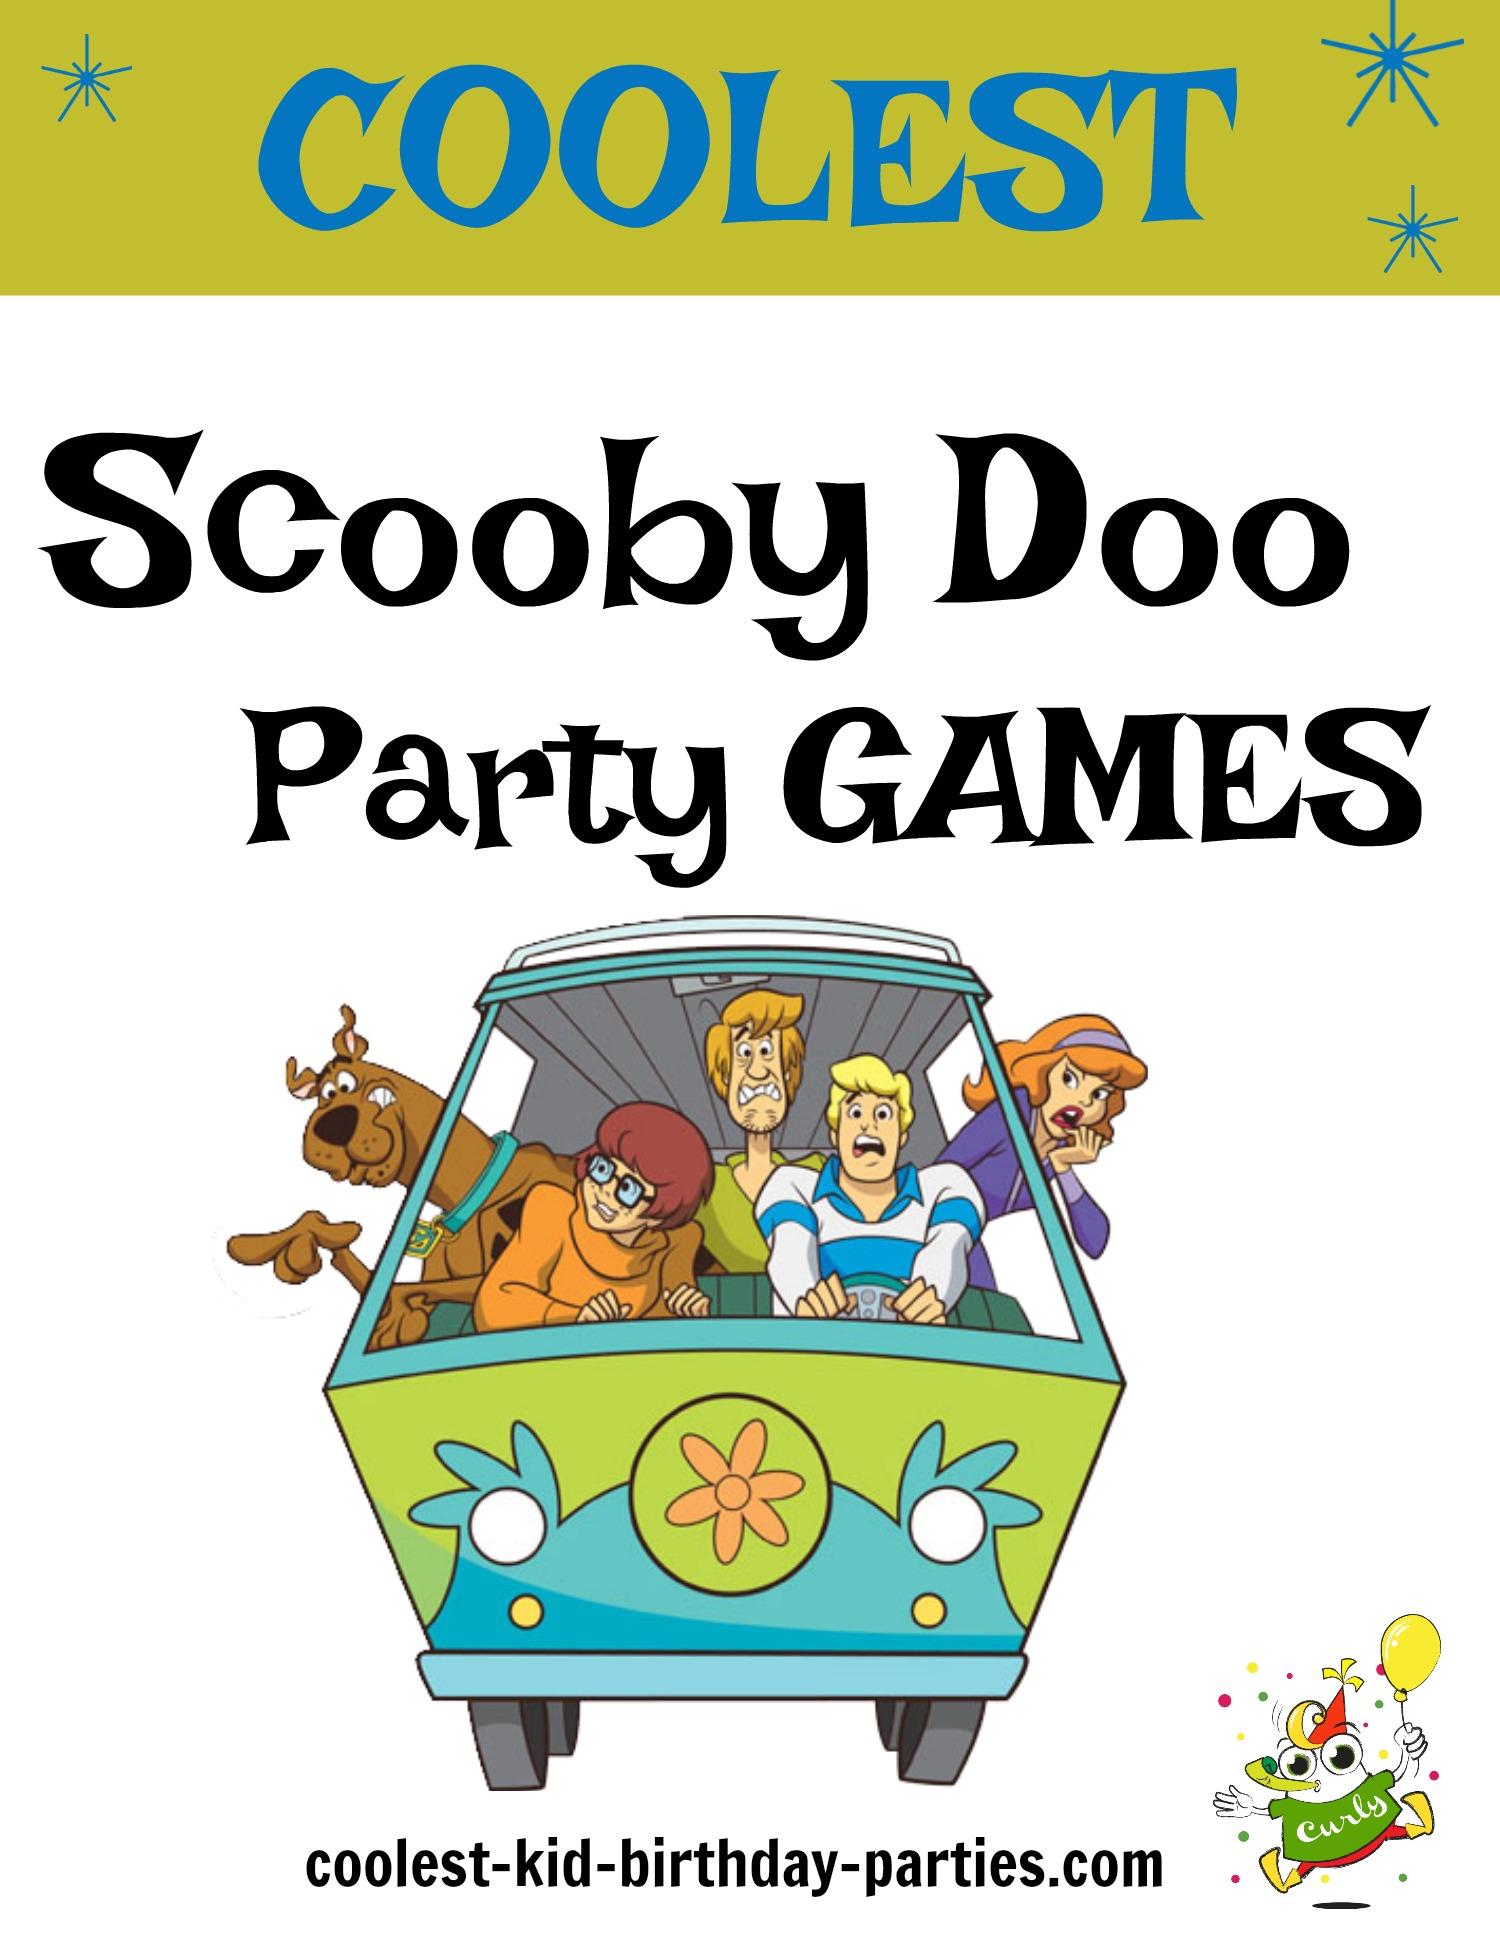 Scooby Doo Game